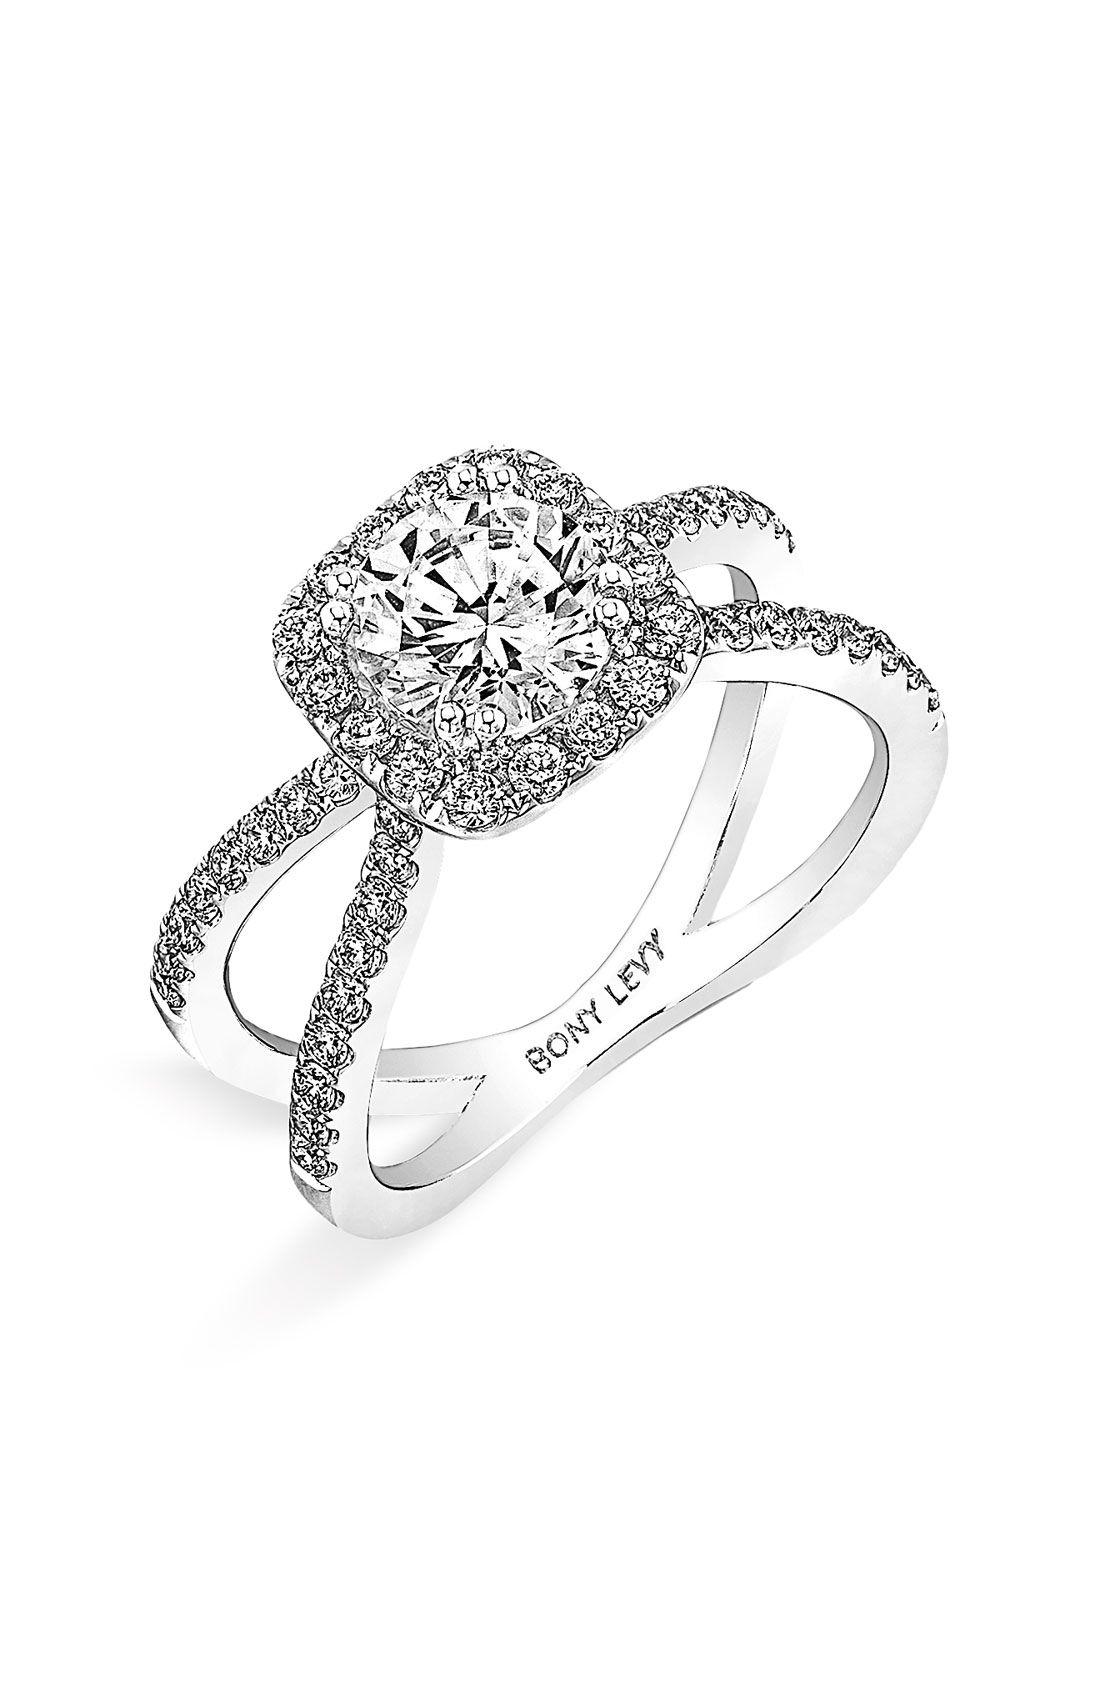 david yurman wedding rings Women s Bony Levy Crisscross Pave Diamond Engagement Ring Setting Nordstrom Exclusive